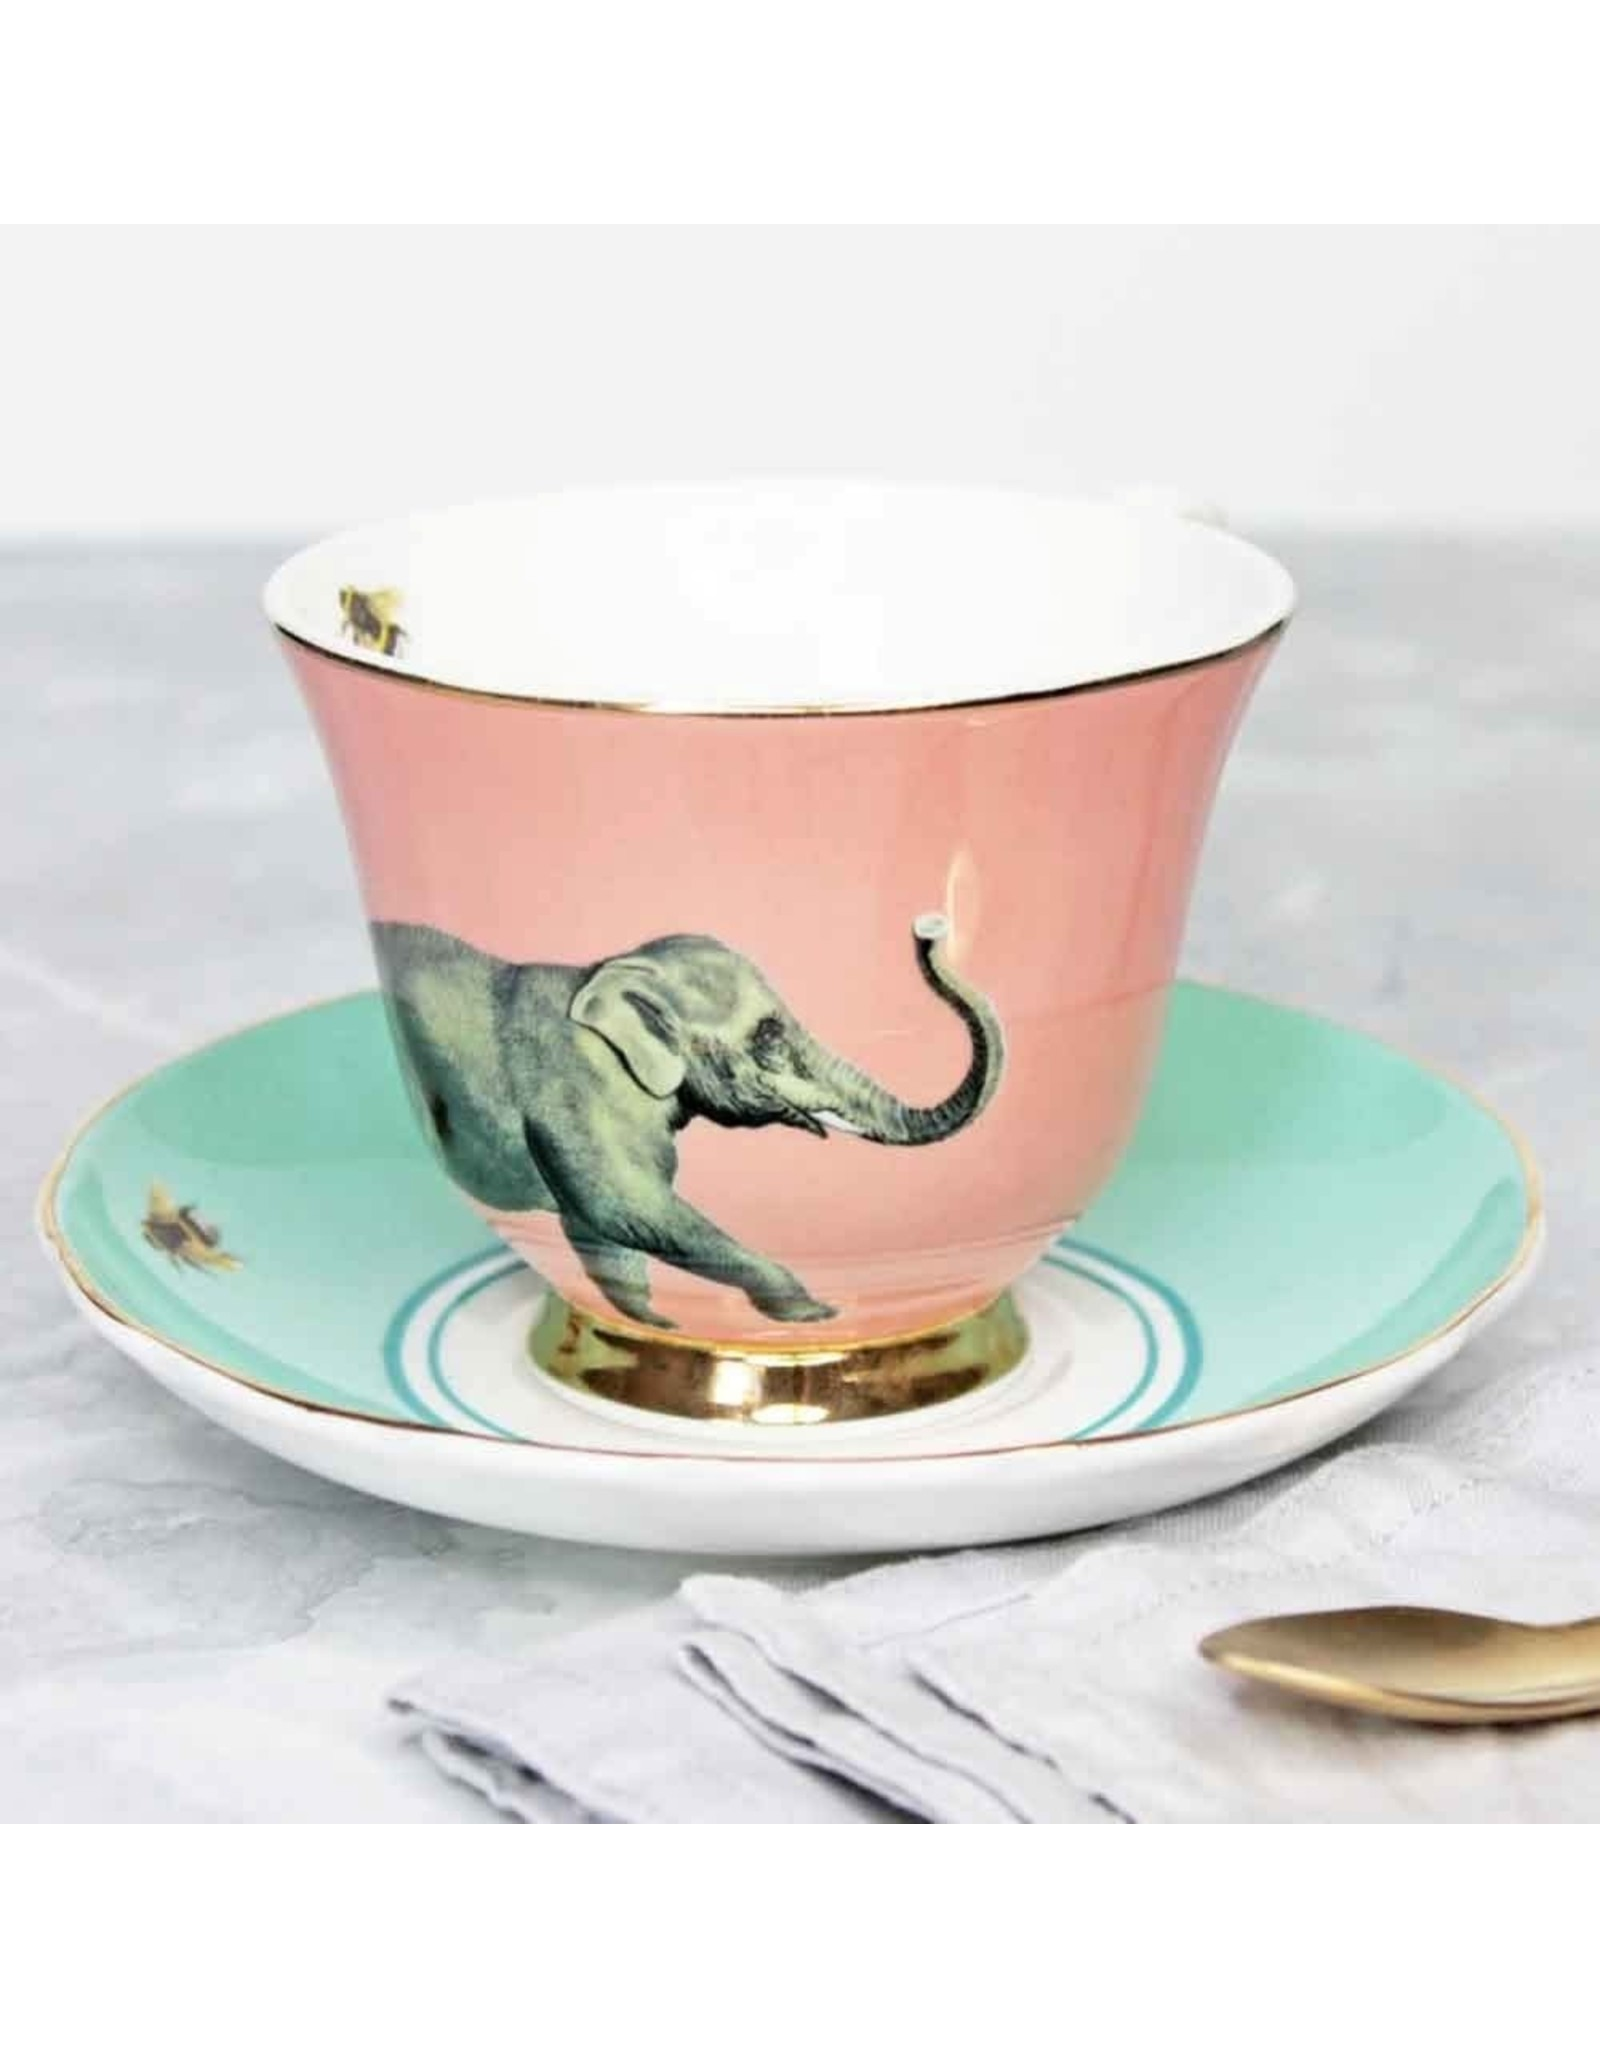 Yvonne Ellen Animals - Elephant Teacup & Saucer